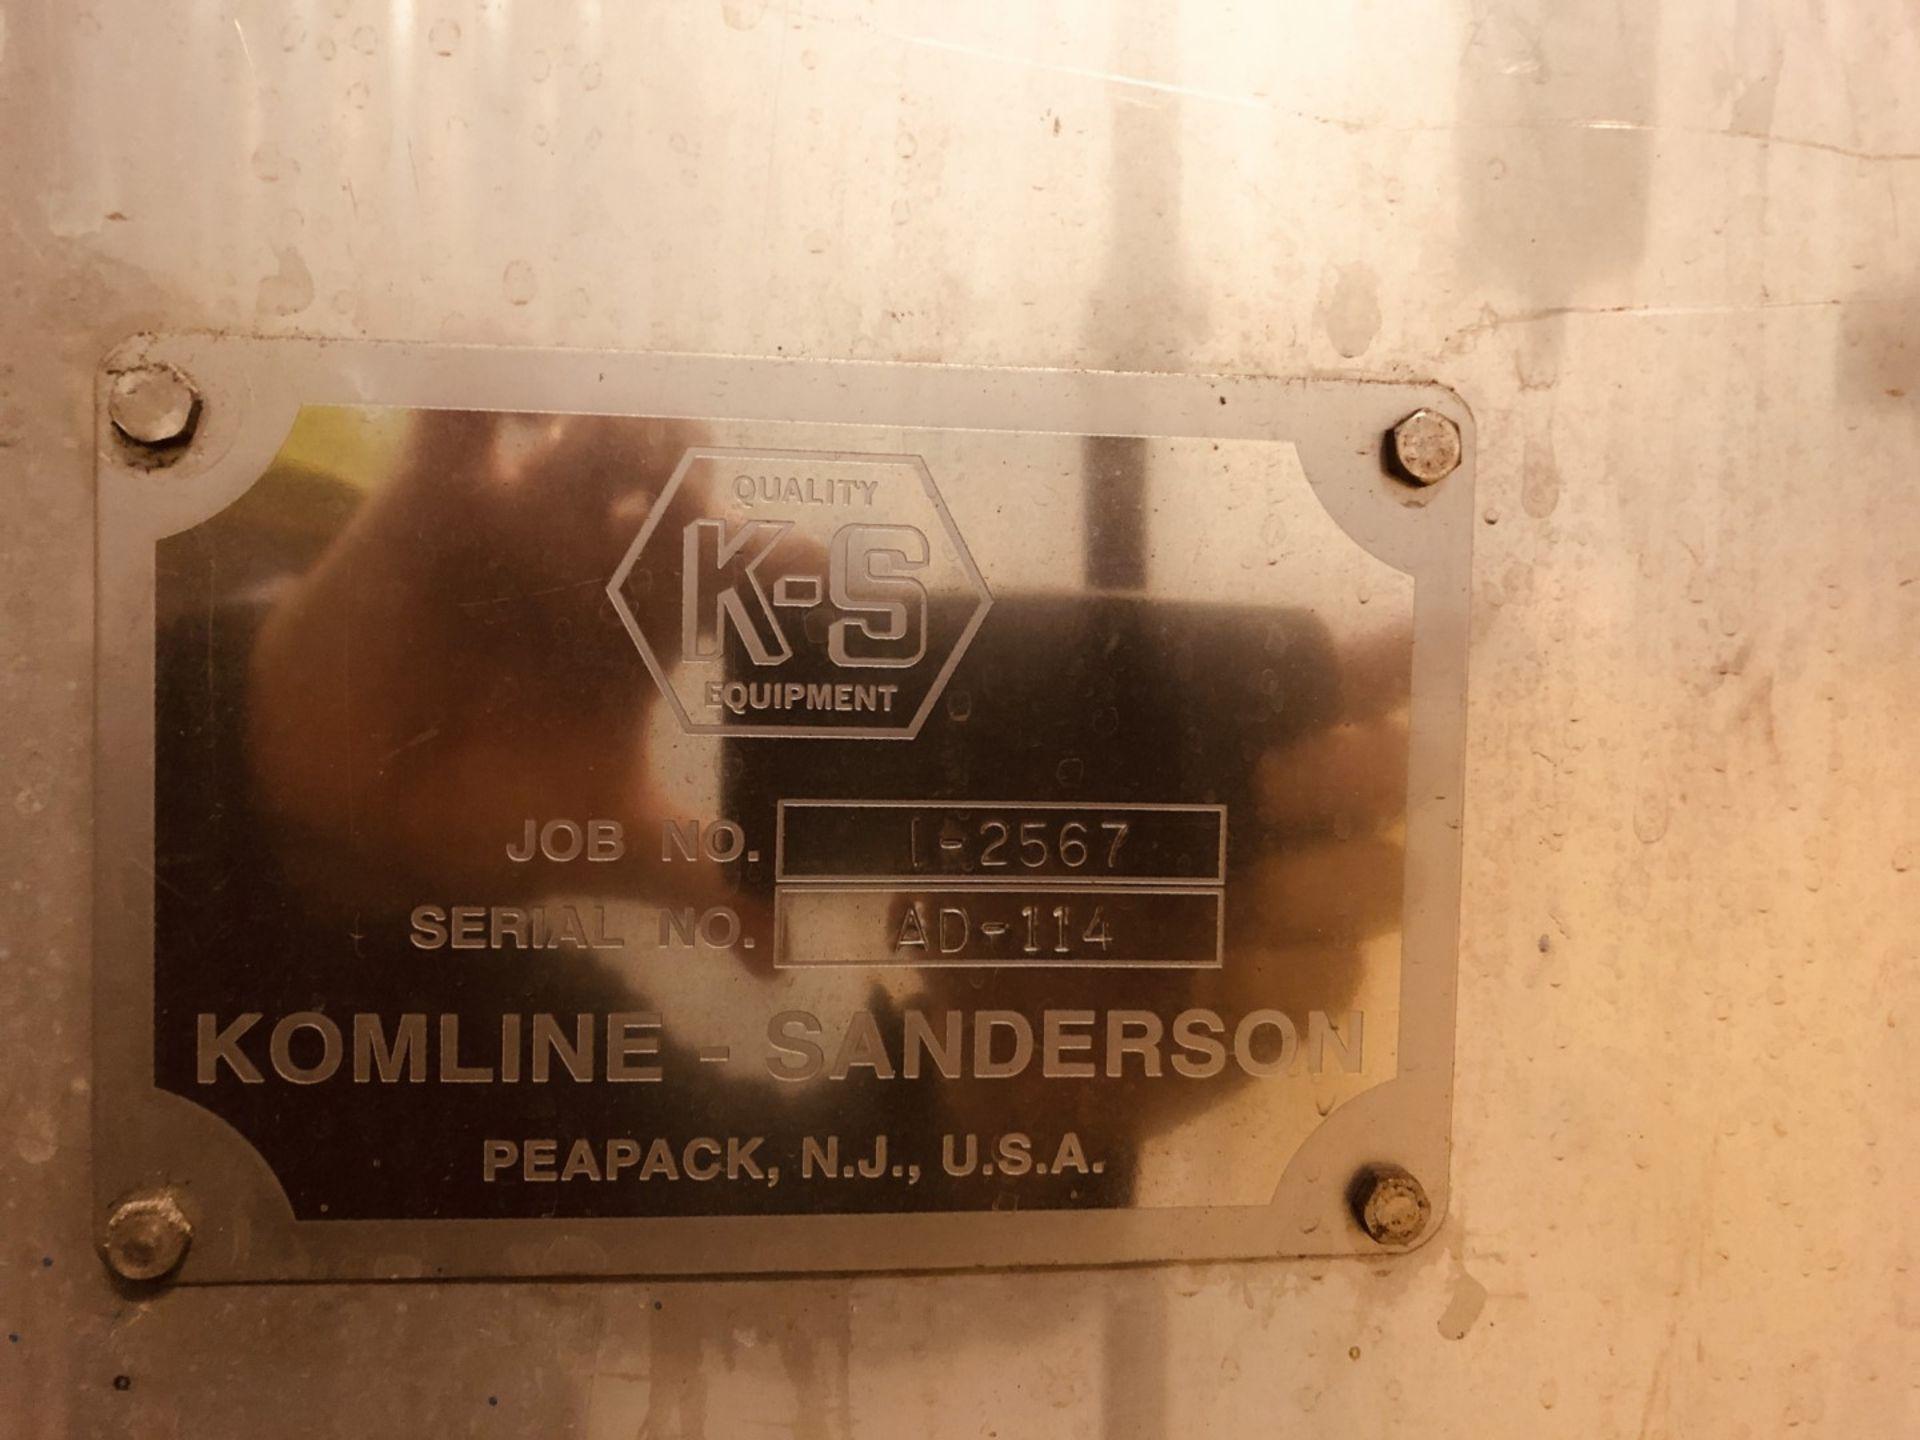 Komline Sanderson Model CIX HVF 1.25x9.75m 11.25 Sq Meter Horizontal Belt Vacuum Filter - Image 14 of 14